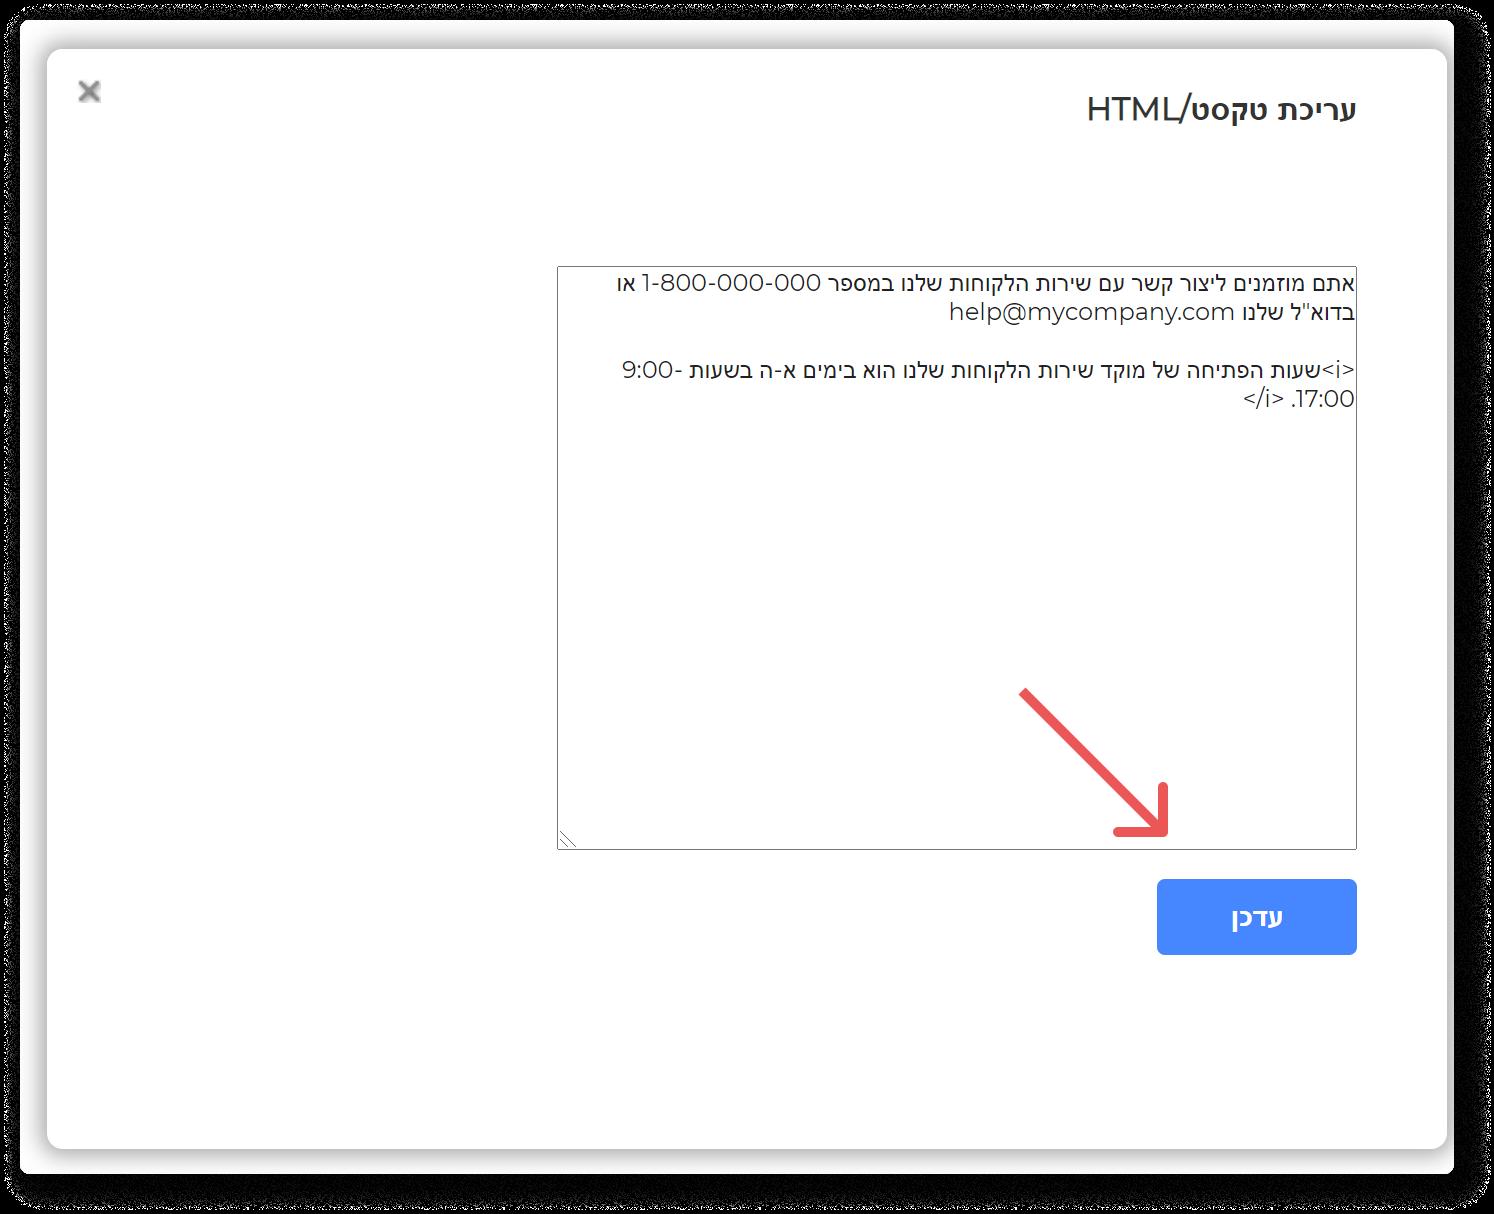 add HTML to answer